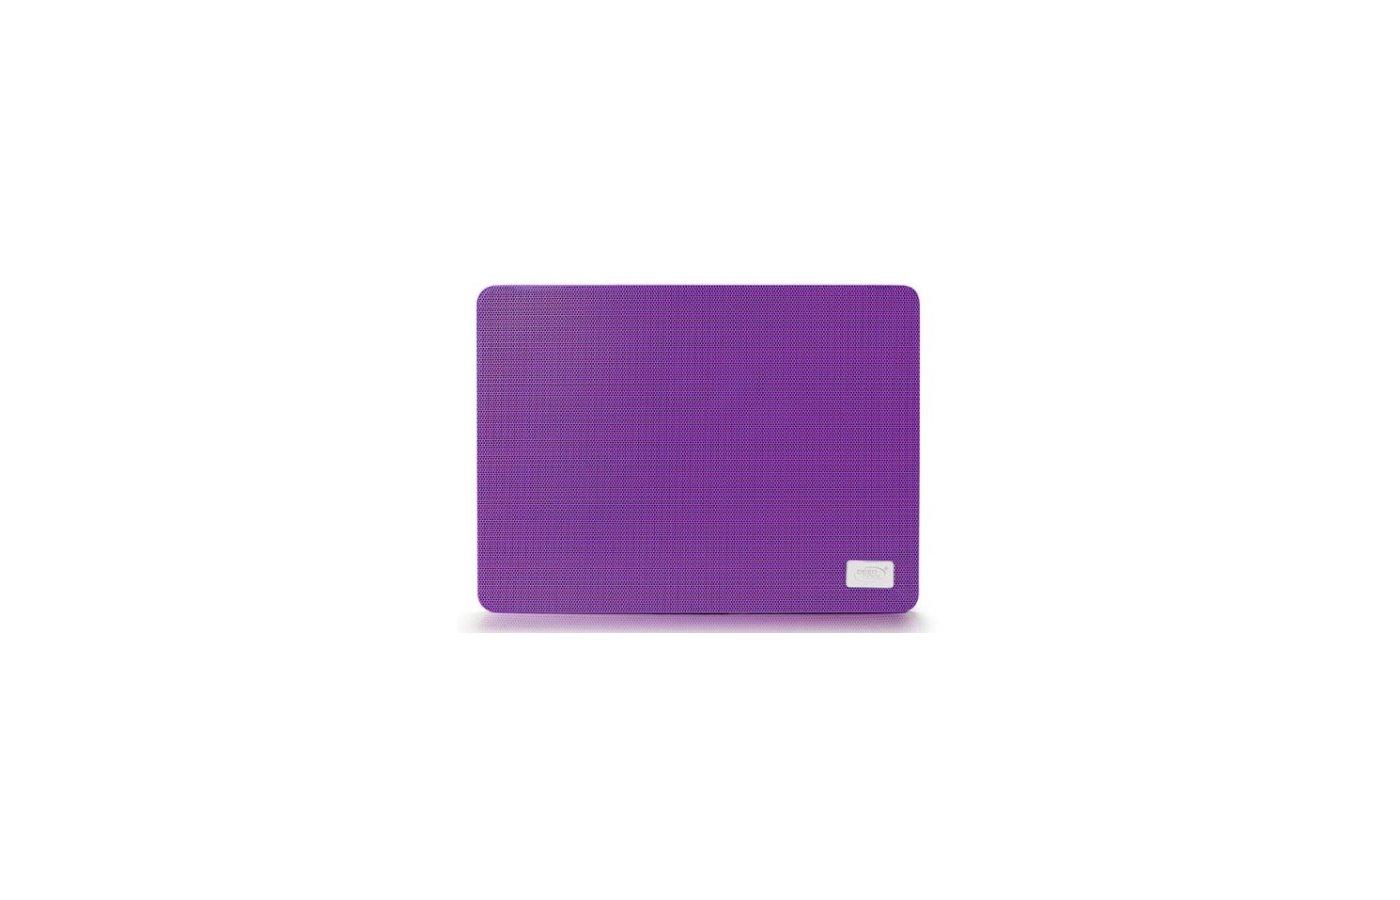 Подставка для ноутбука Deepcool N1 пурпурный (N1PURPLE)